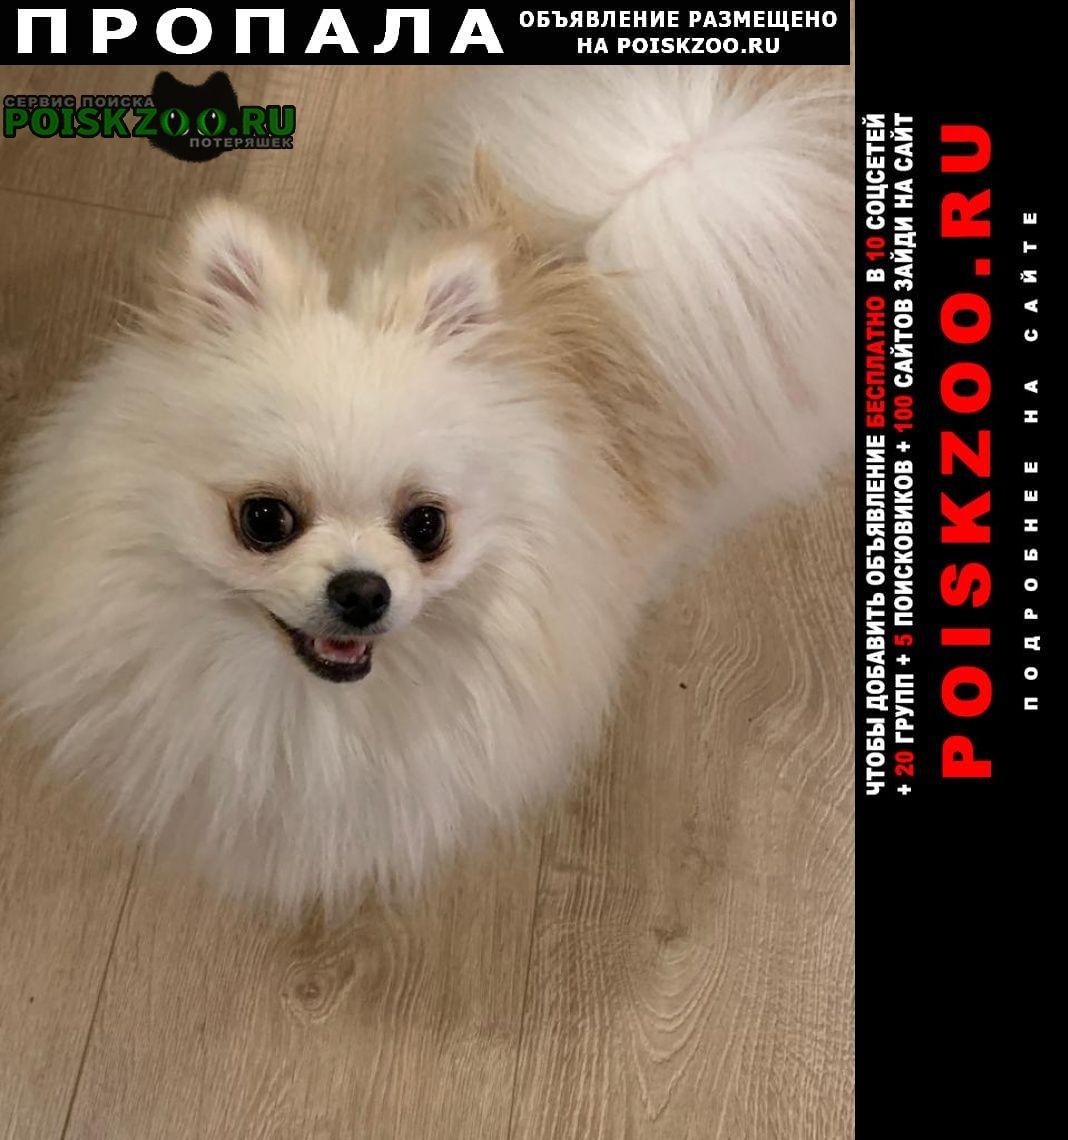 Пропала собака кобель друг Омск